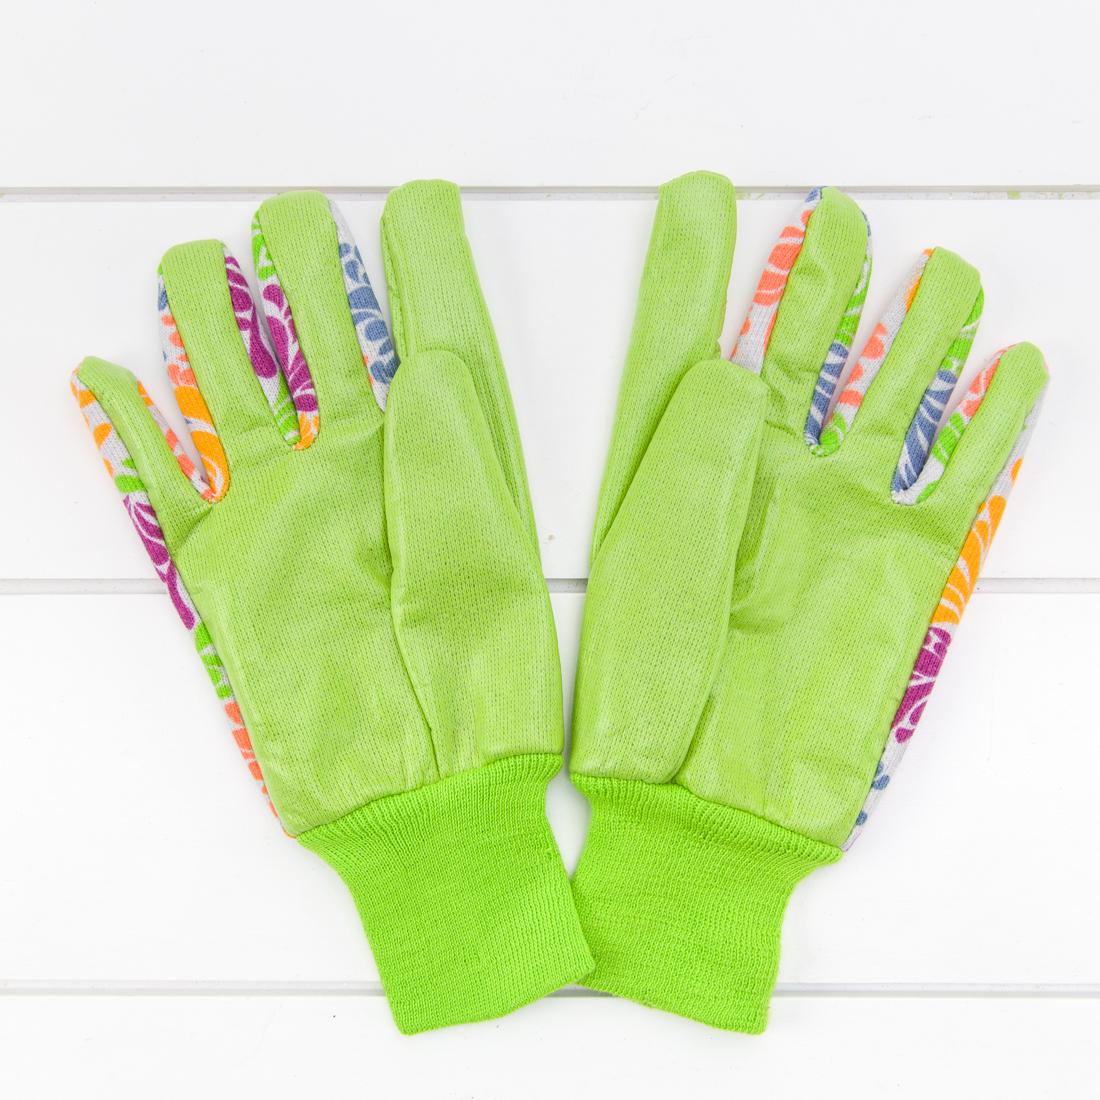 Floral Printed Garden Gloves